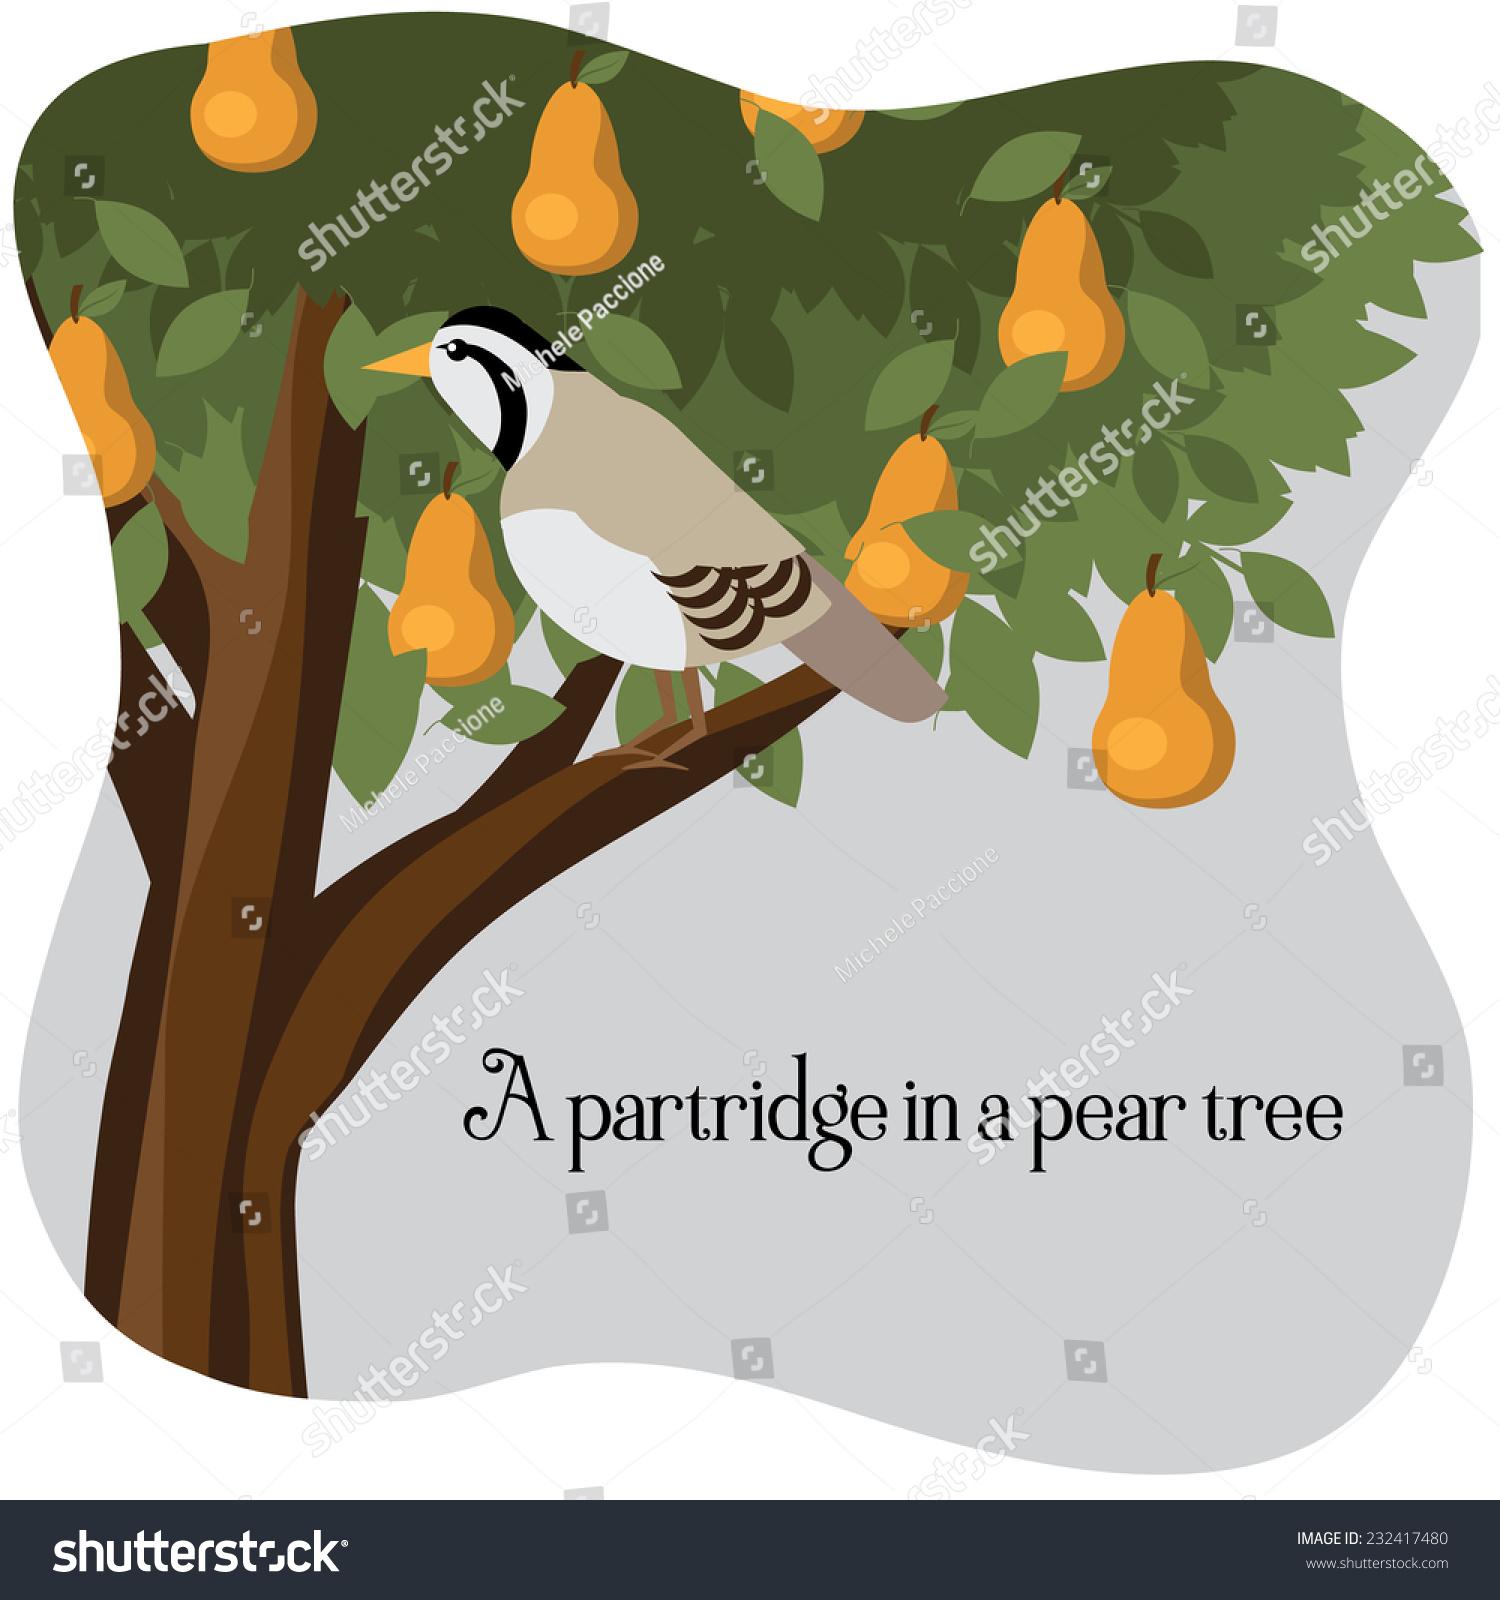 Partridge Pear Tree Stock Illustration 232417480 - Shutterstock